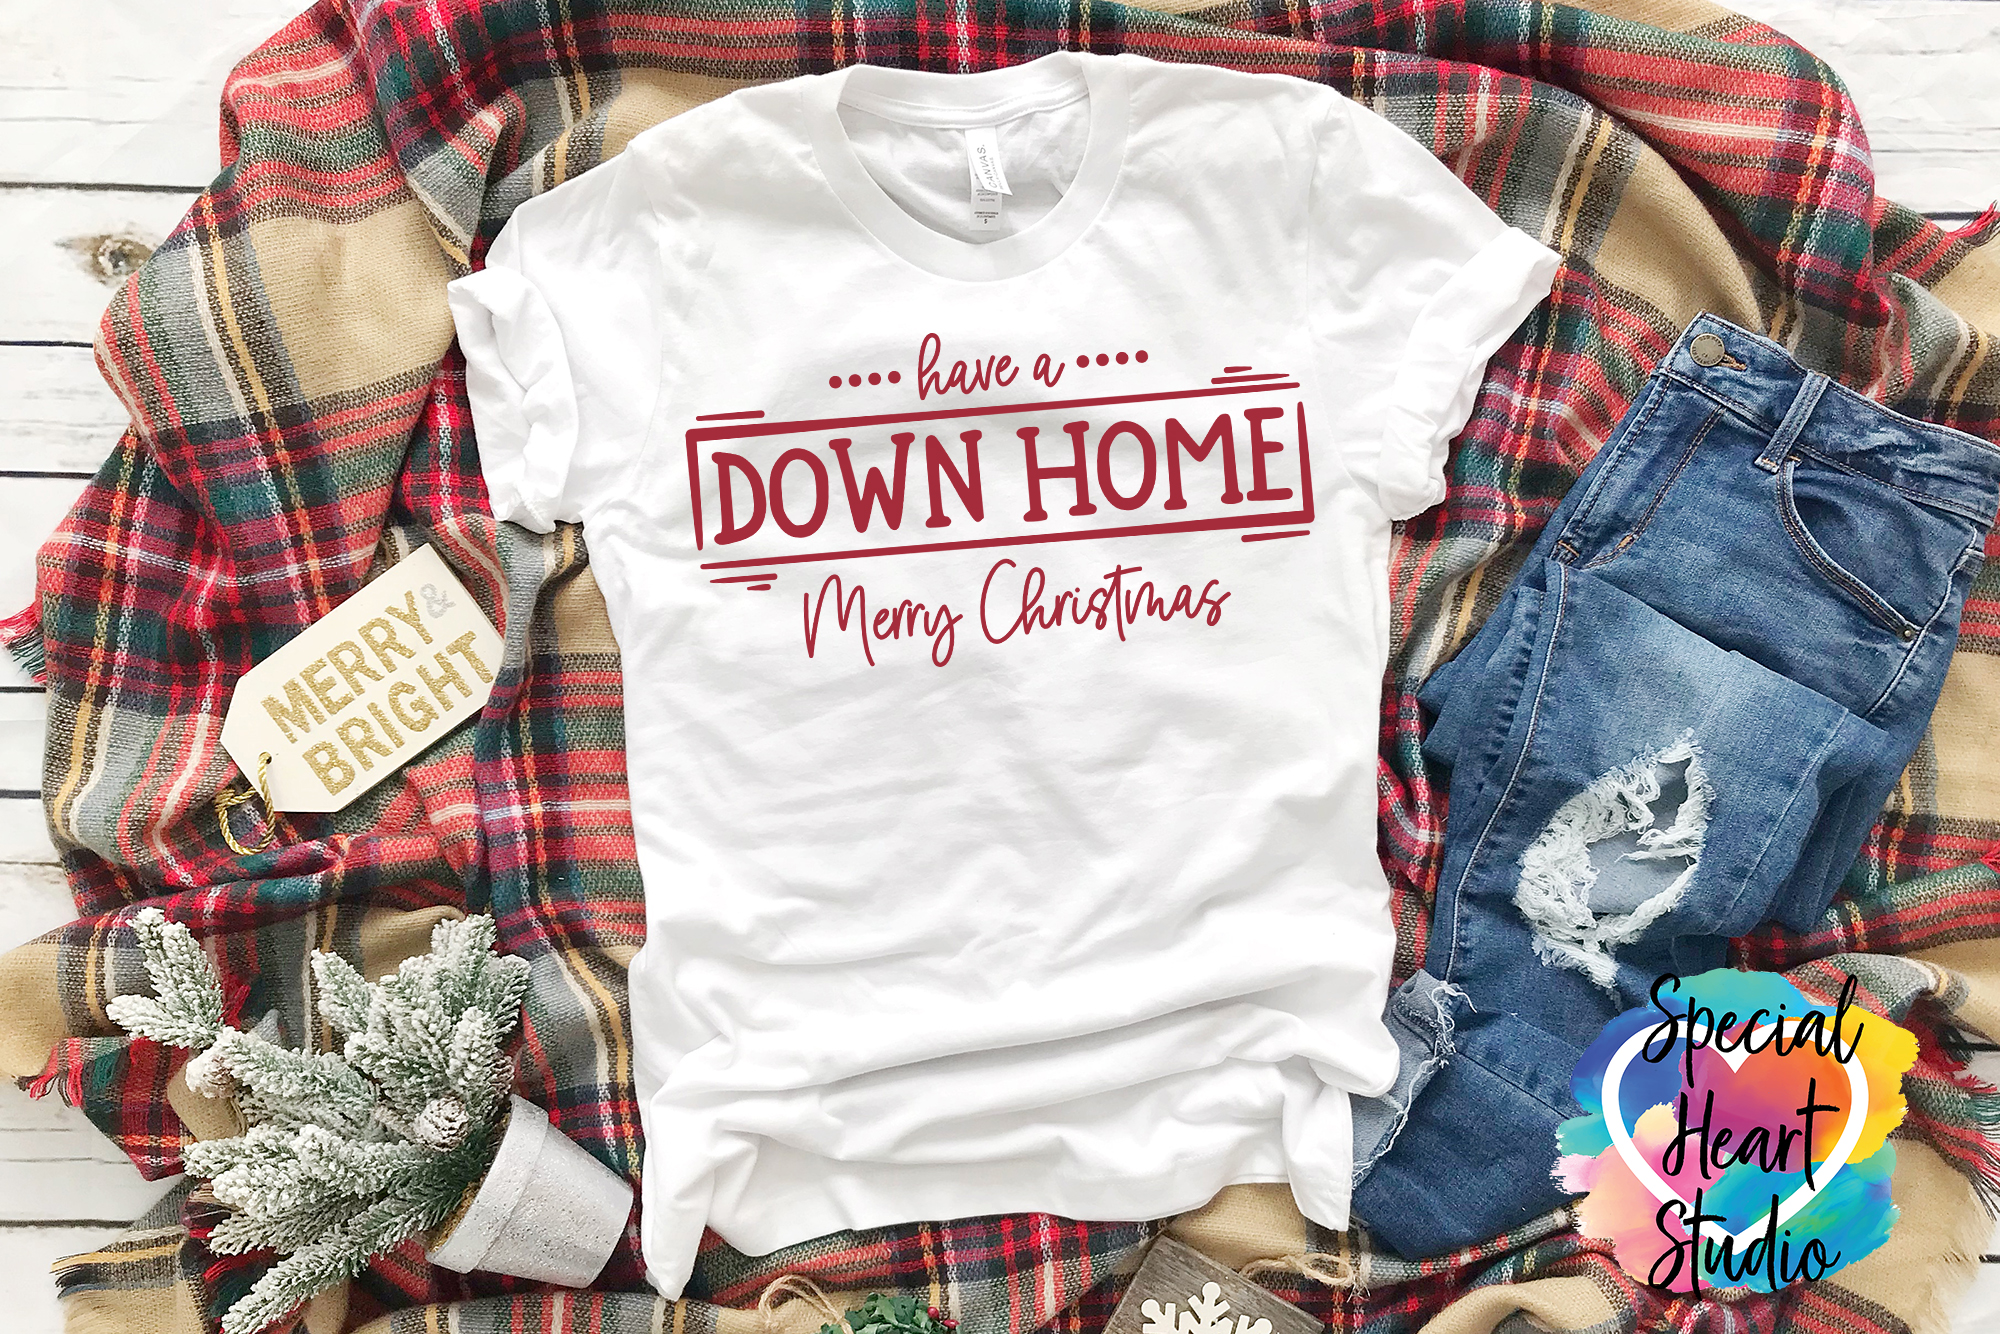 Down Home Christmas - A Christmas SVG Cut File example image 1